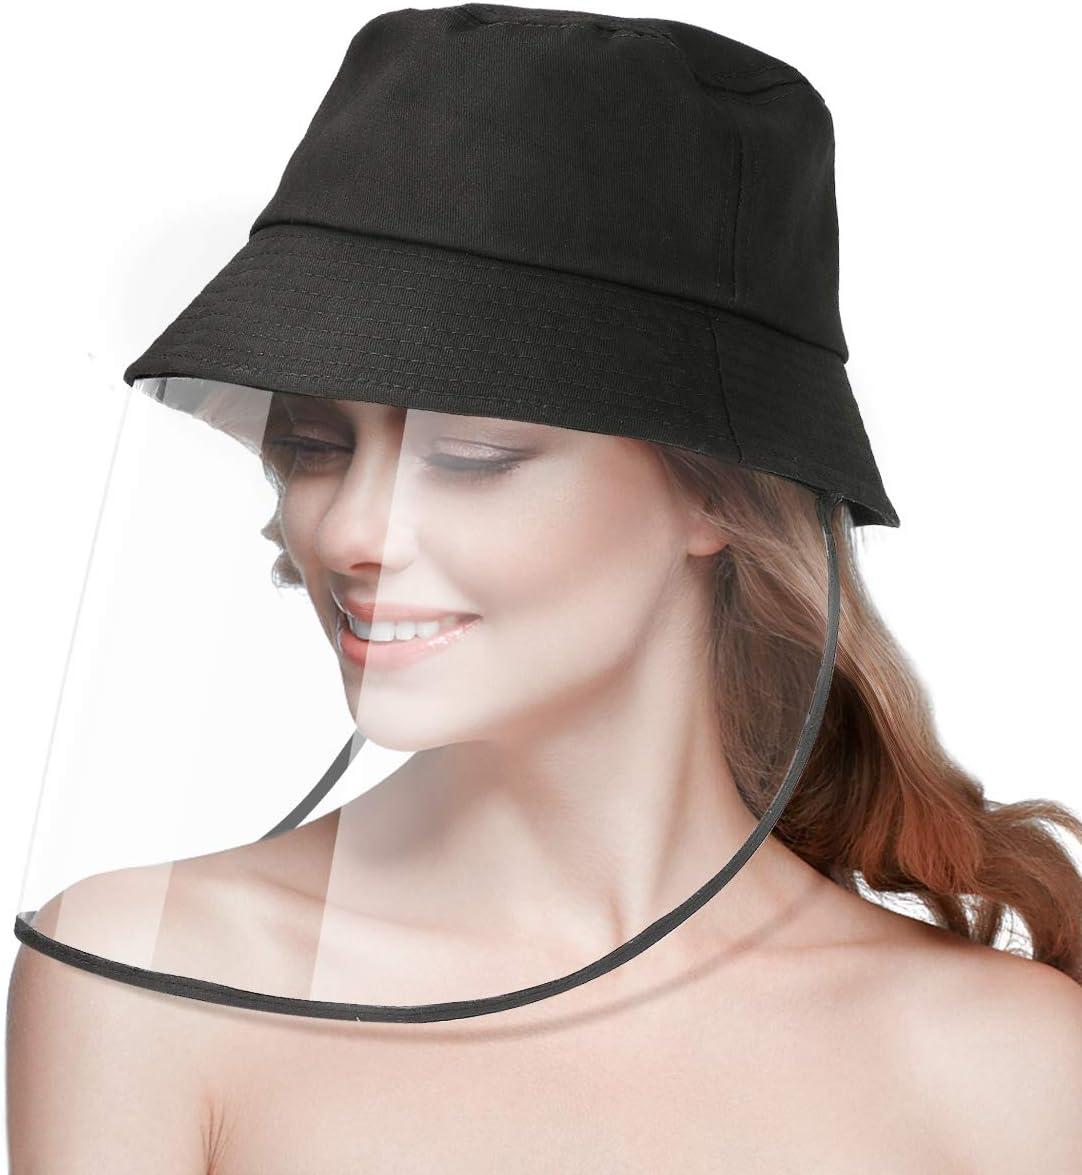 Waterproof Anti-UV Anti-Dust Anti-Saliva Cap Protection for Women and Men Protective Face Shield Fisherman Hat【New Mesh design 】 Babyhelen Adults Protective Face Shield Visor Hat